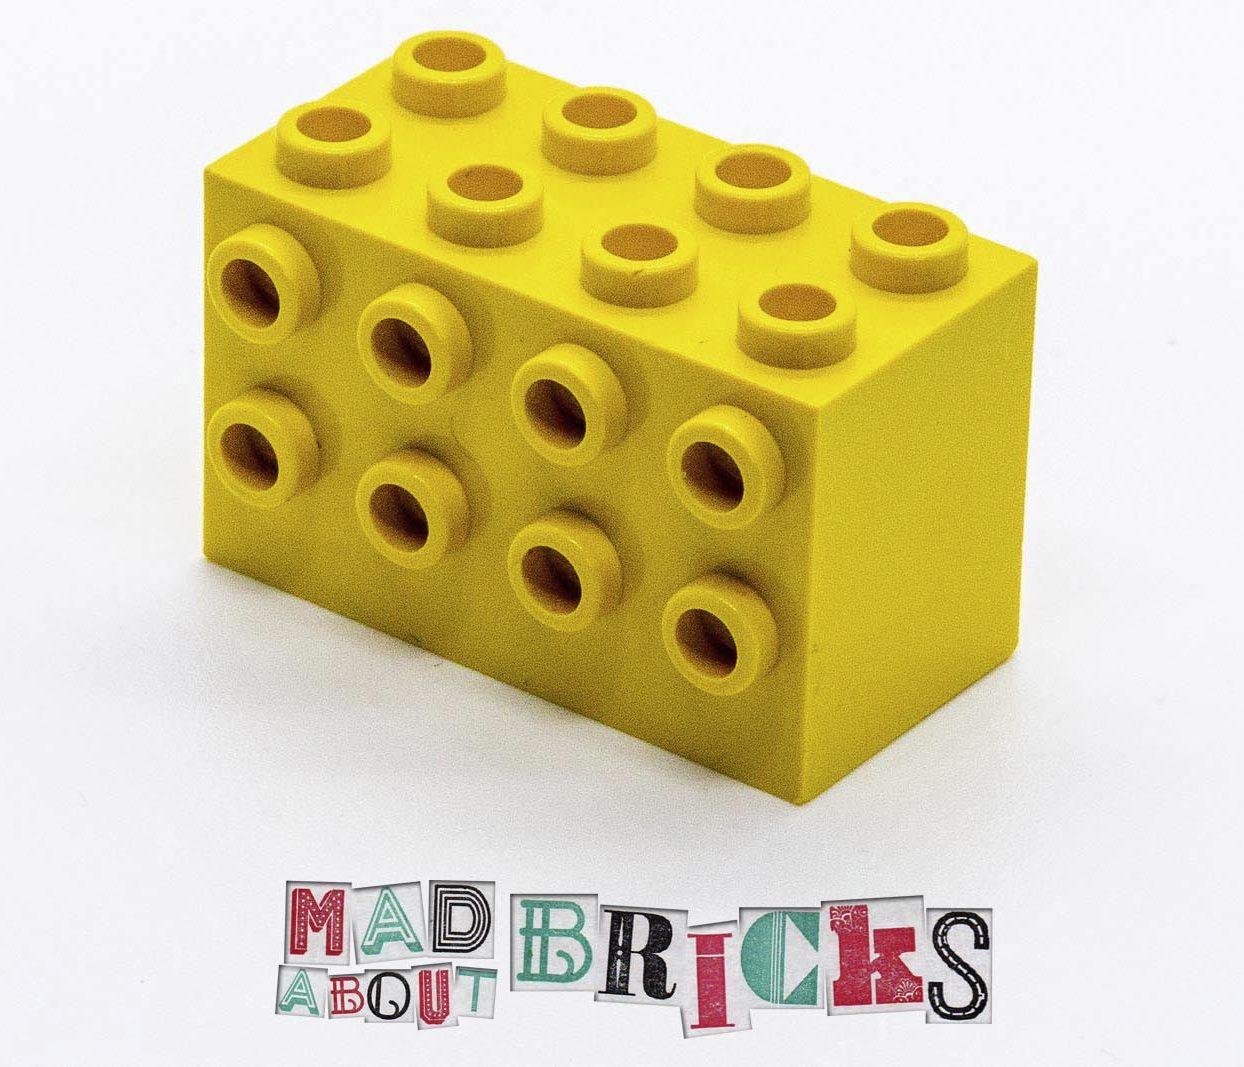 Lego 2434 2x4x2 RARE Knob Stone 525319